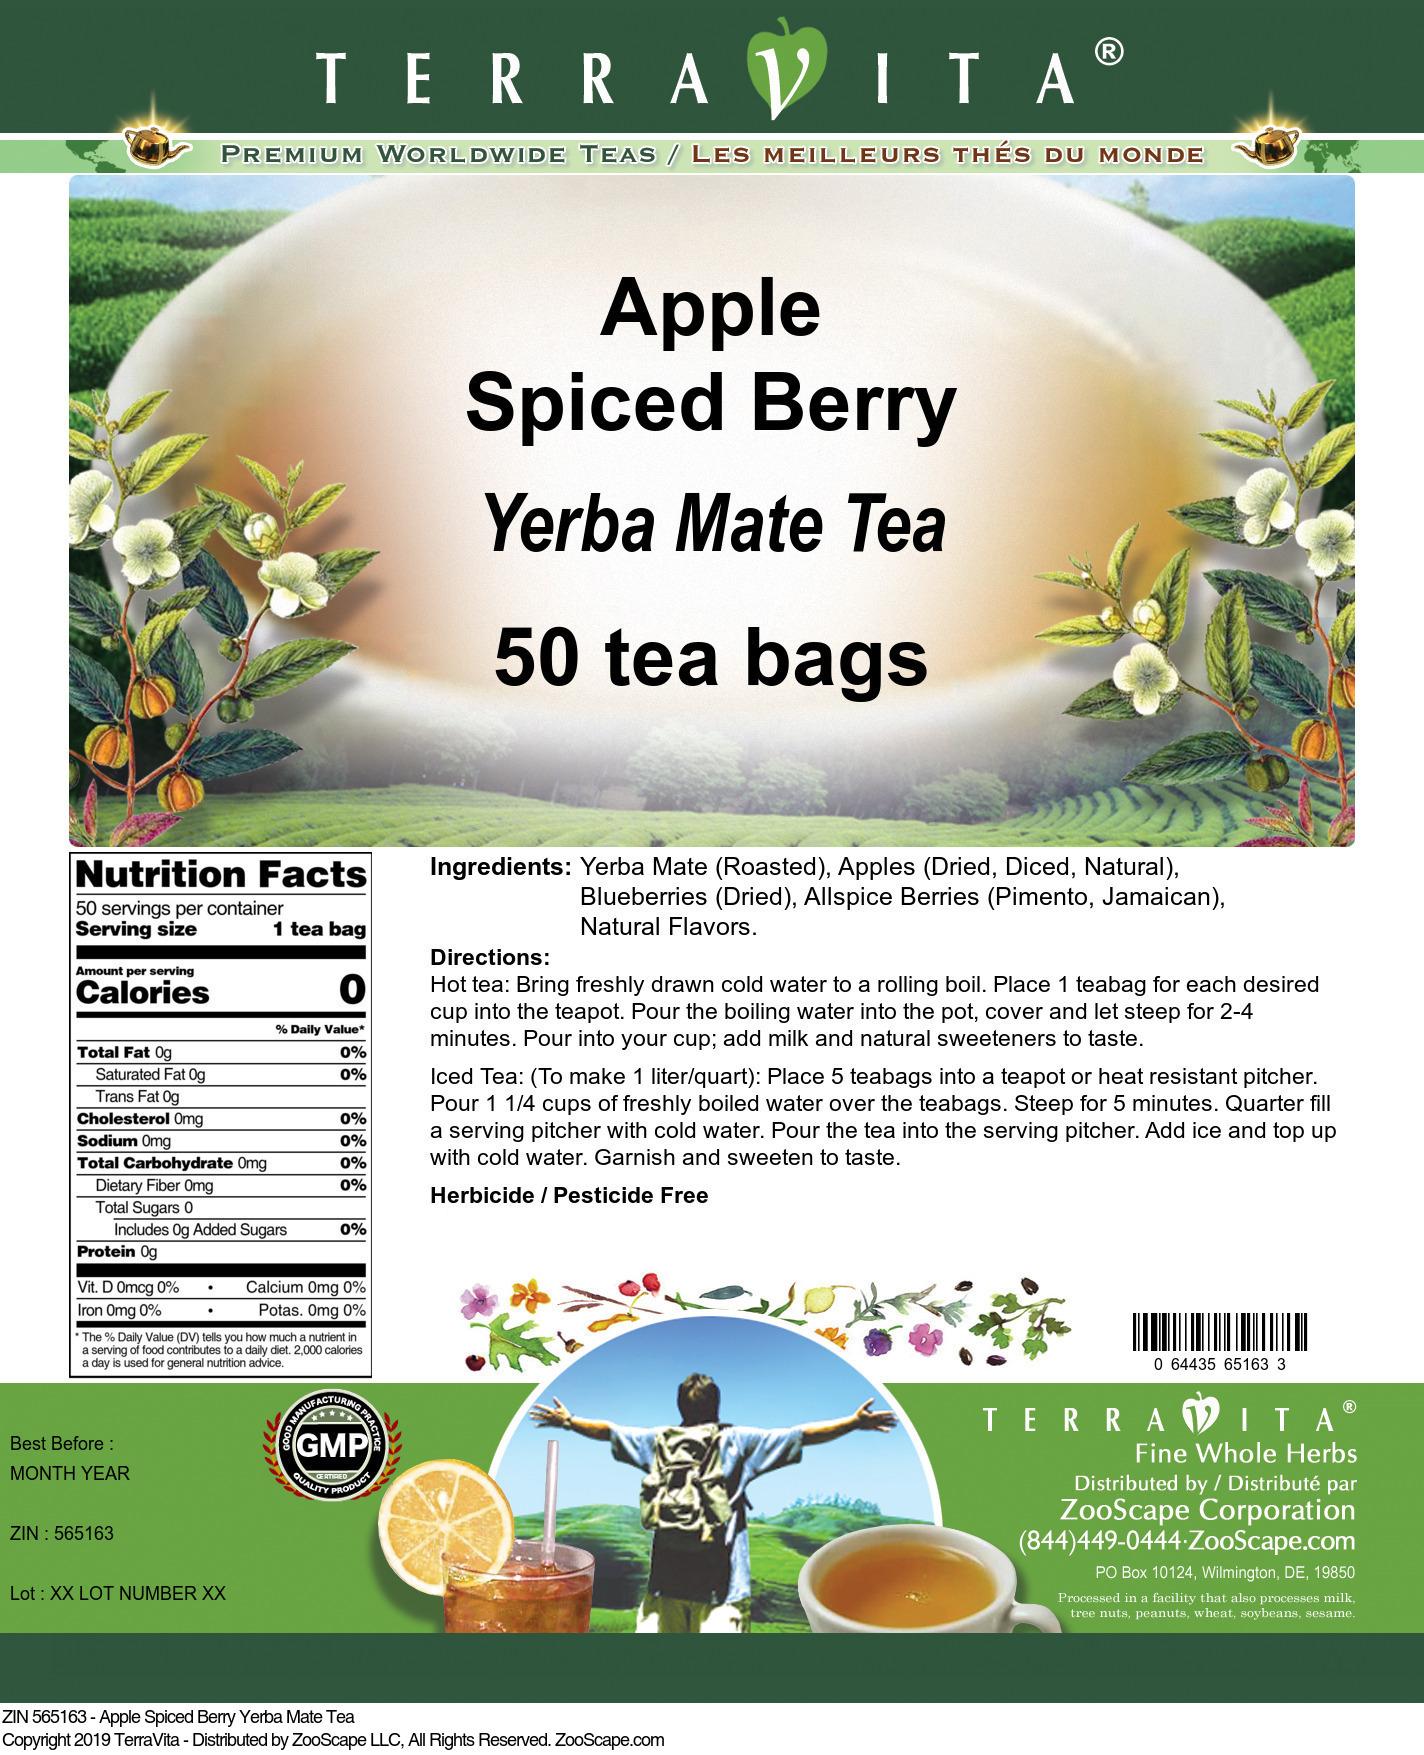 Apple Spiced Berry Yerba Mate Tea